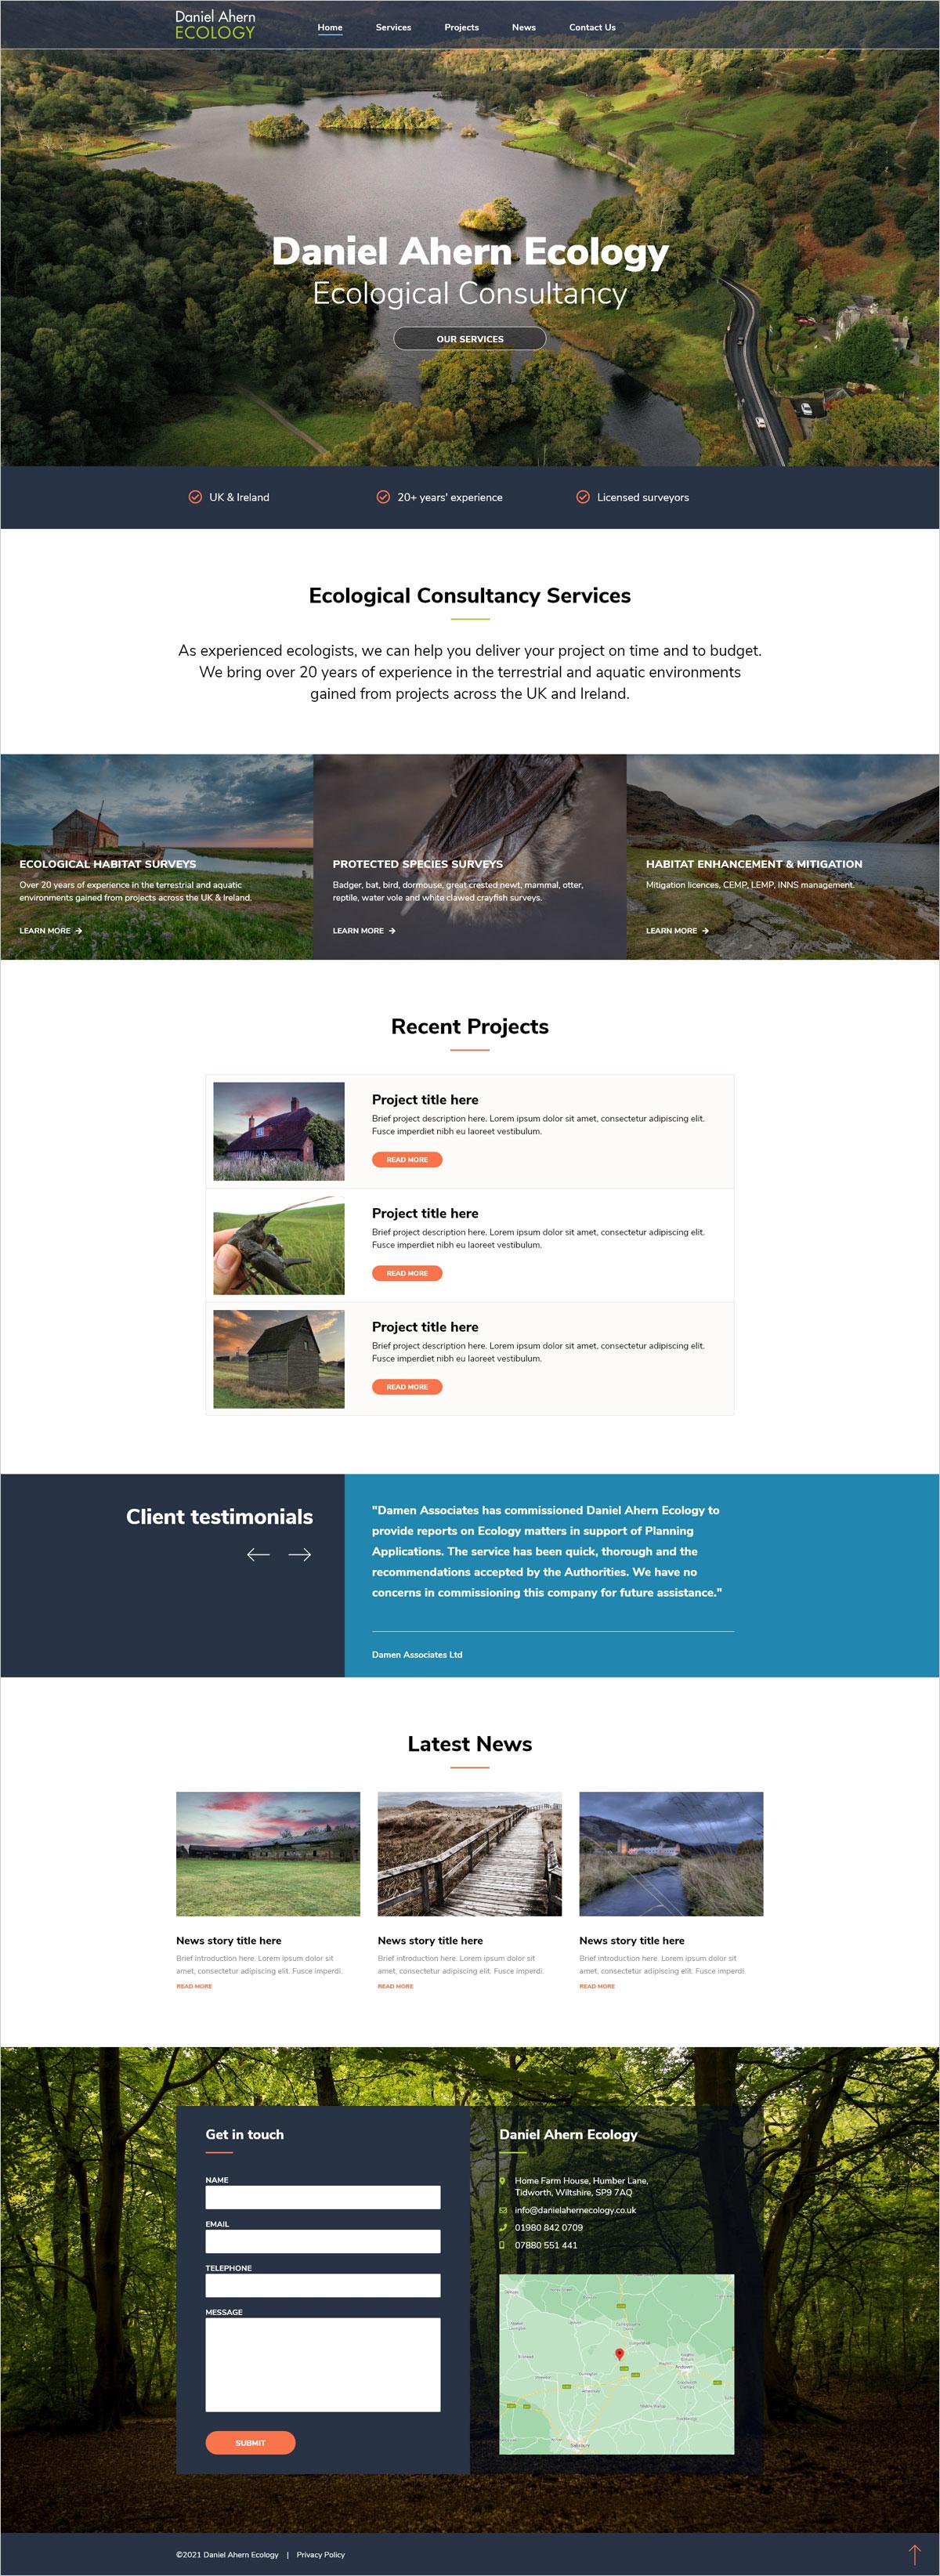 Daniel Ahern Ecology Web Design